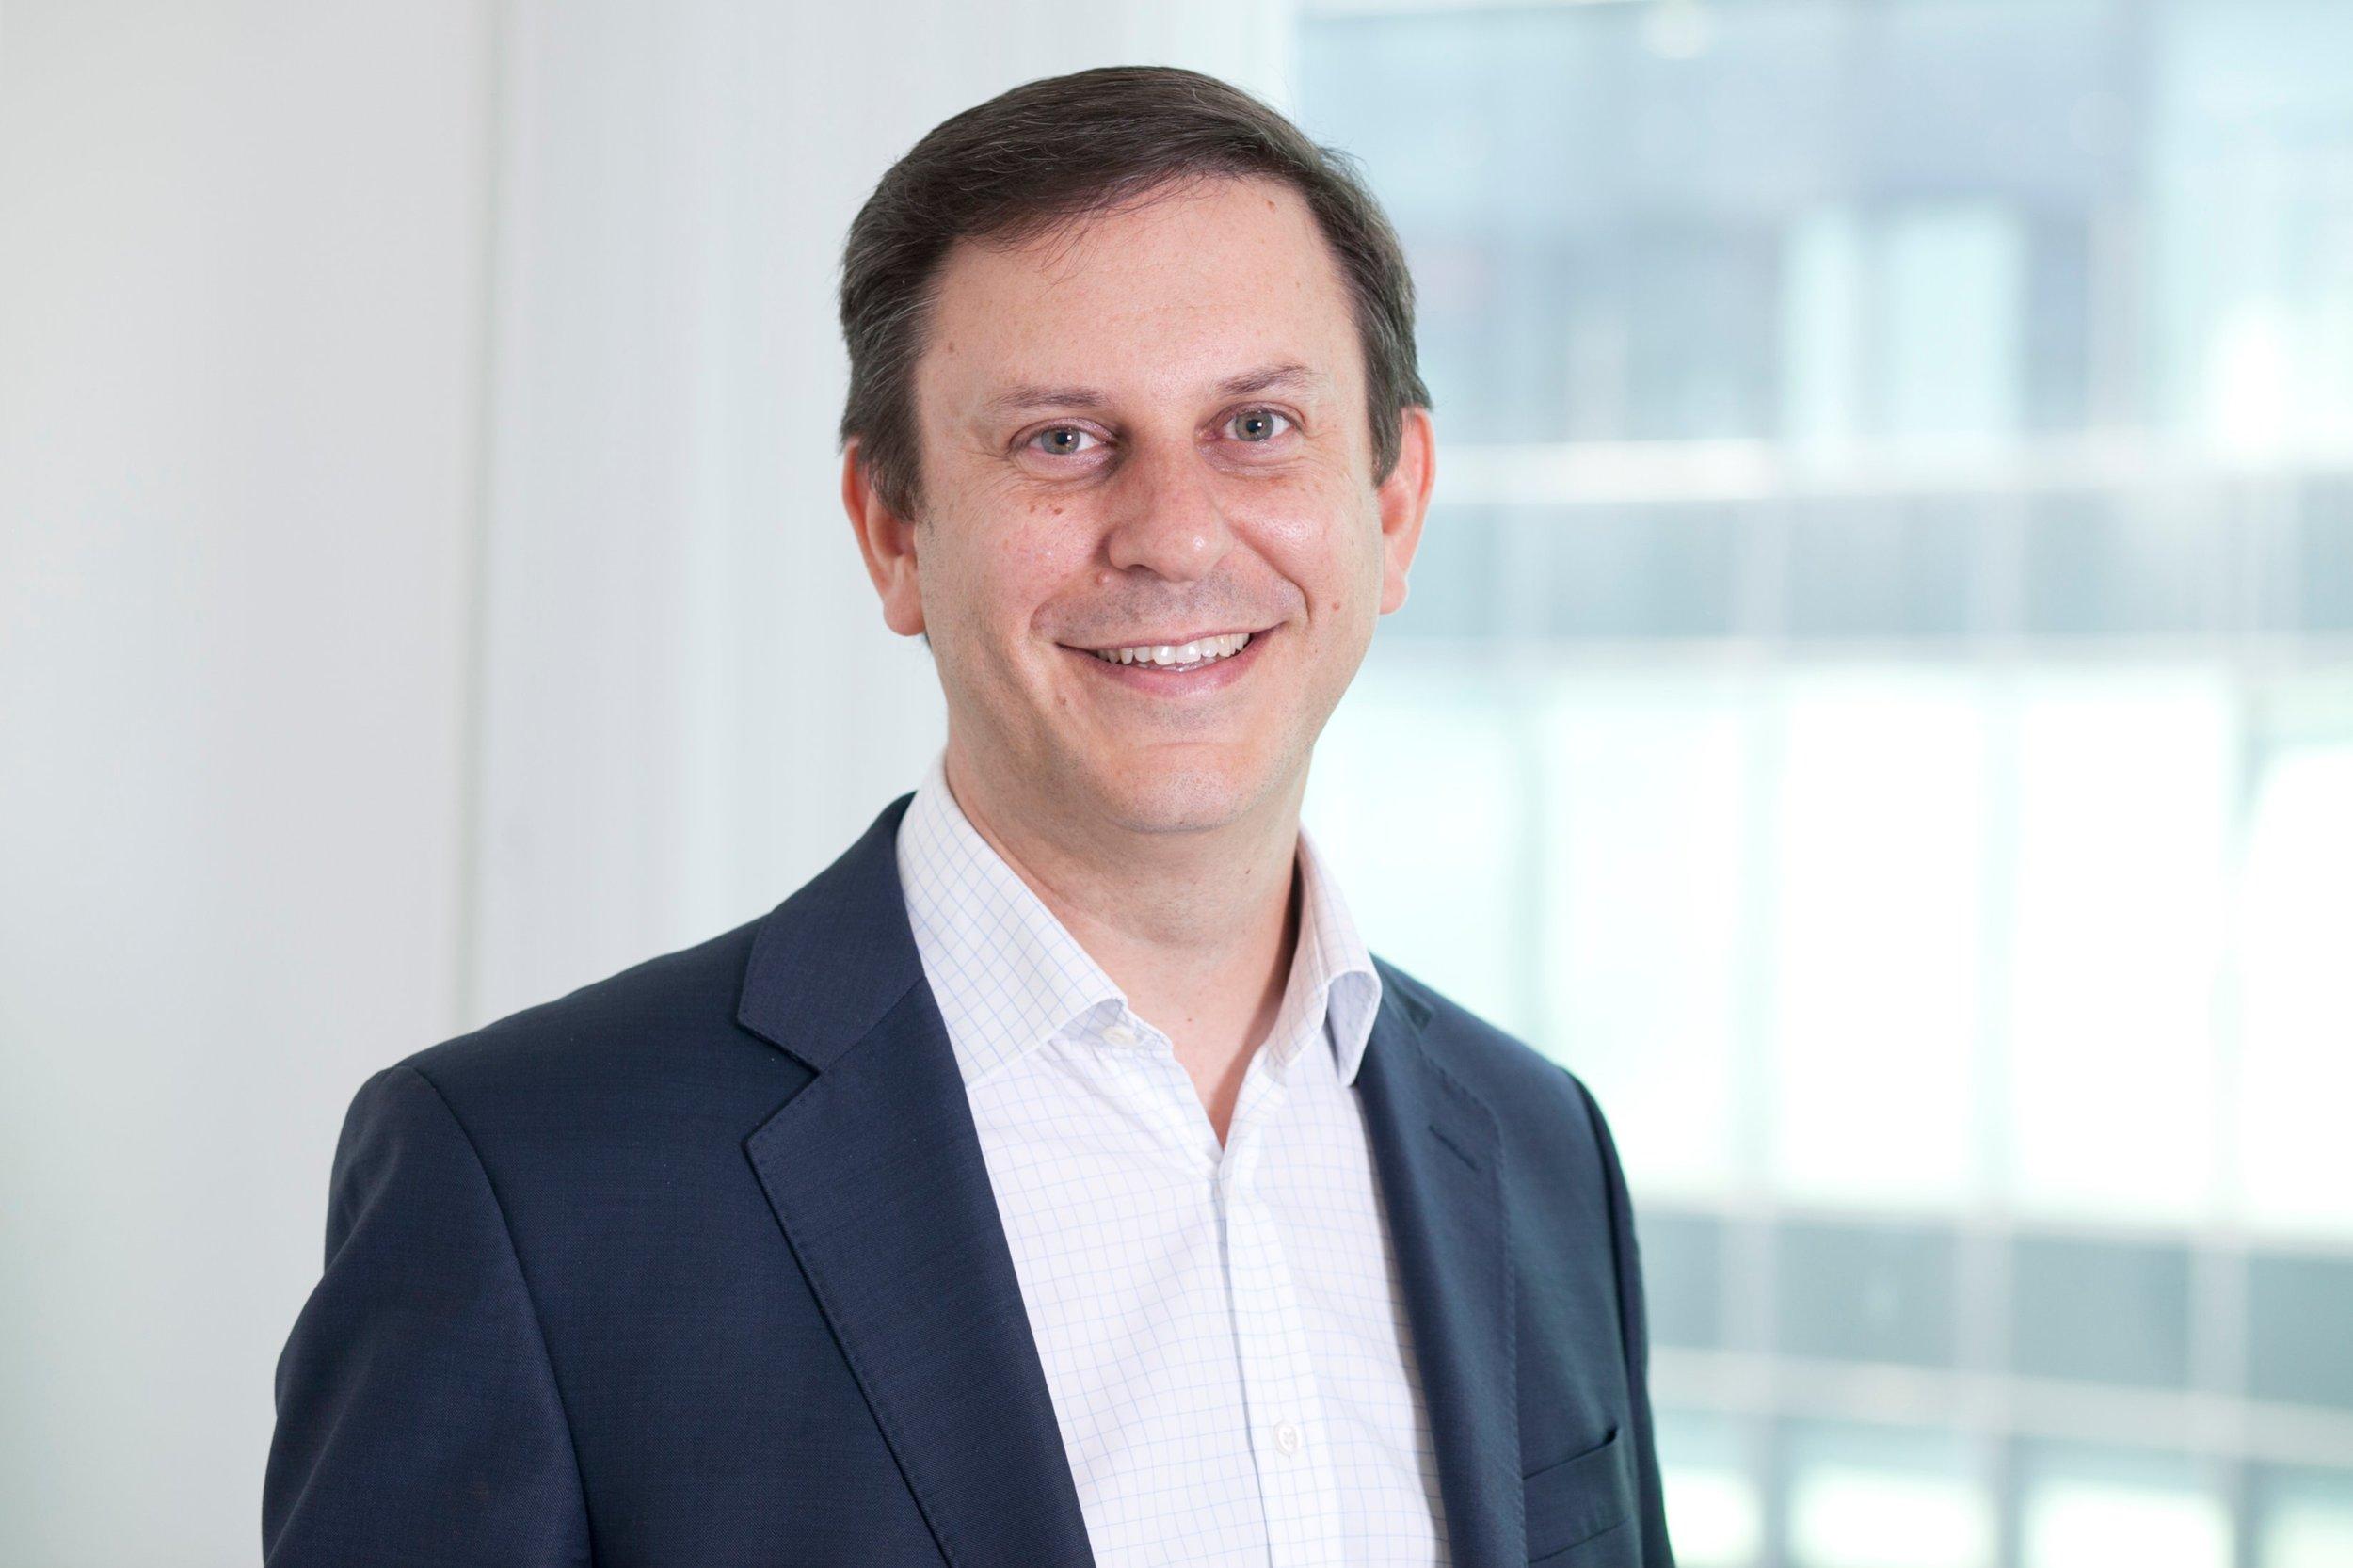 David Lancefield - Strategy& PWC Partner